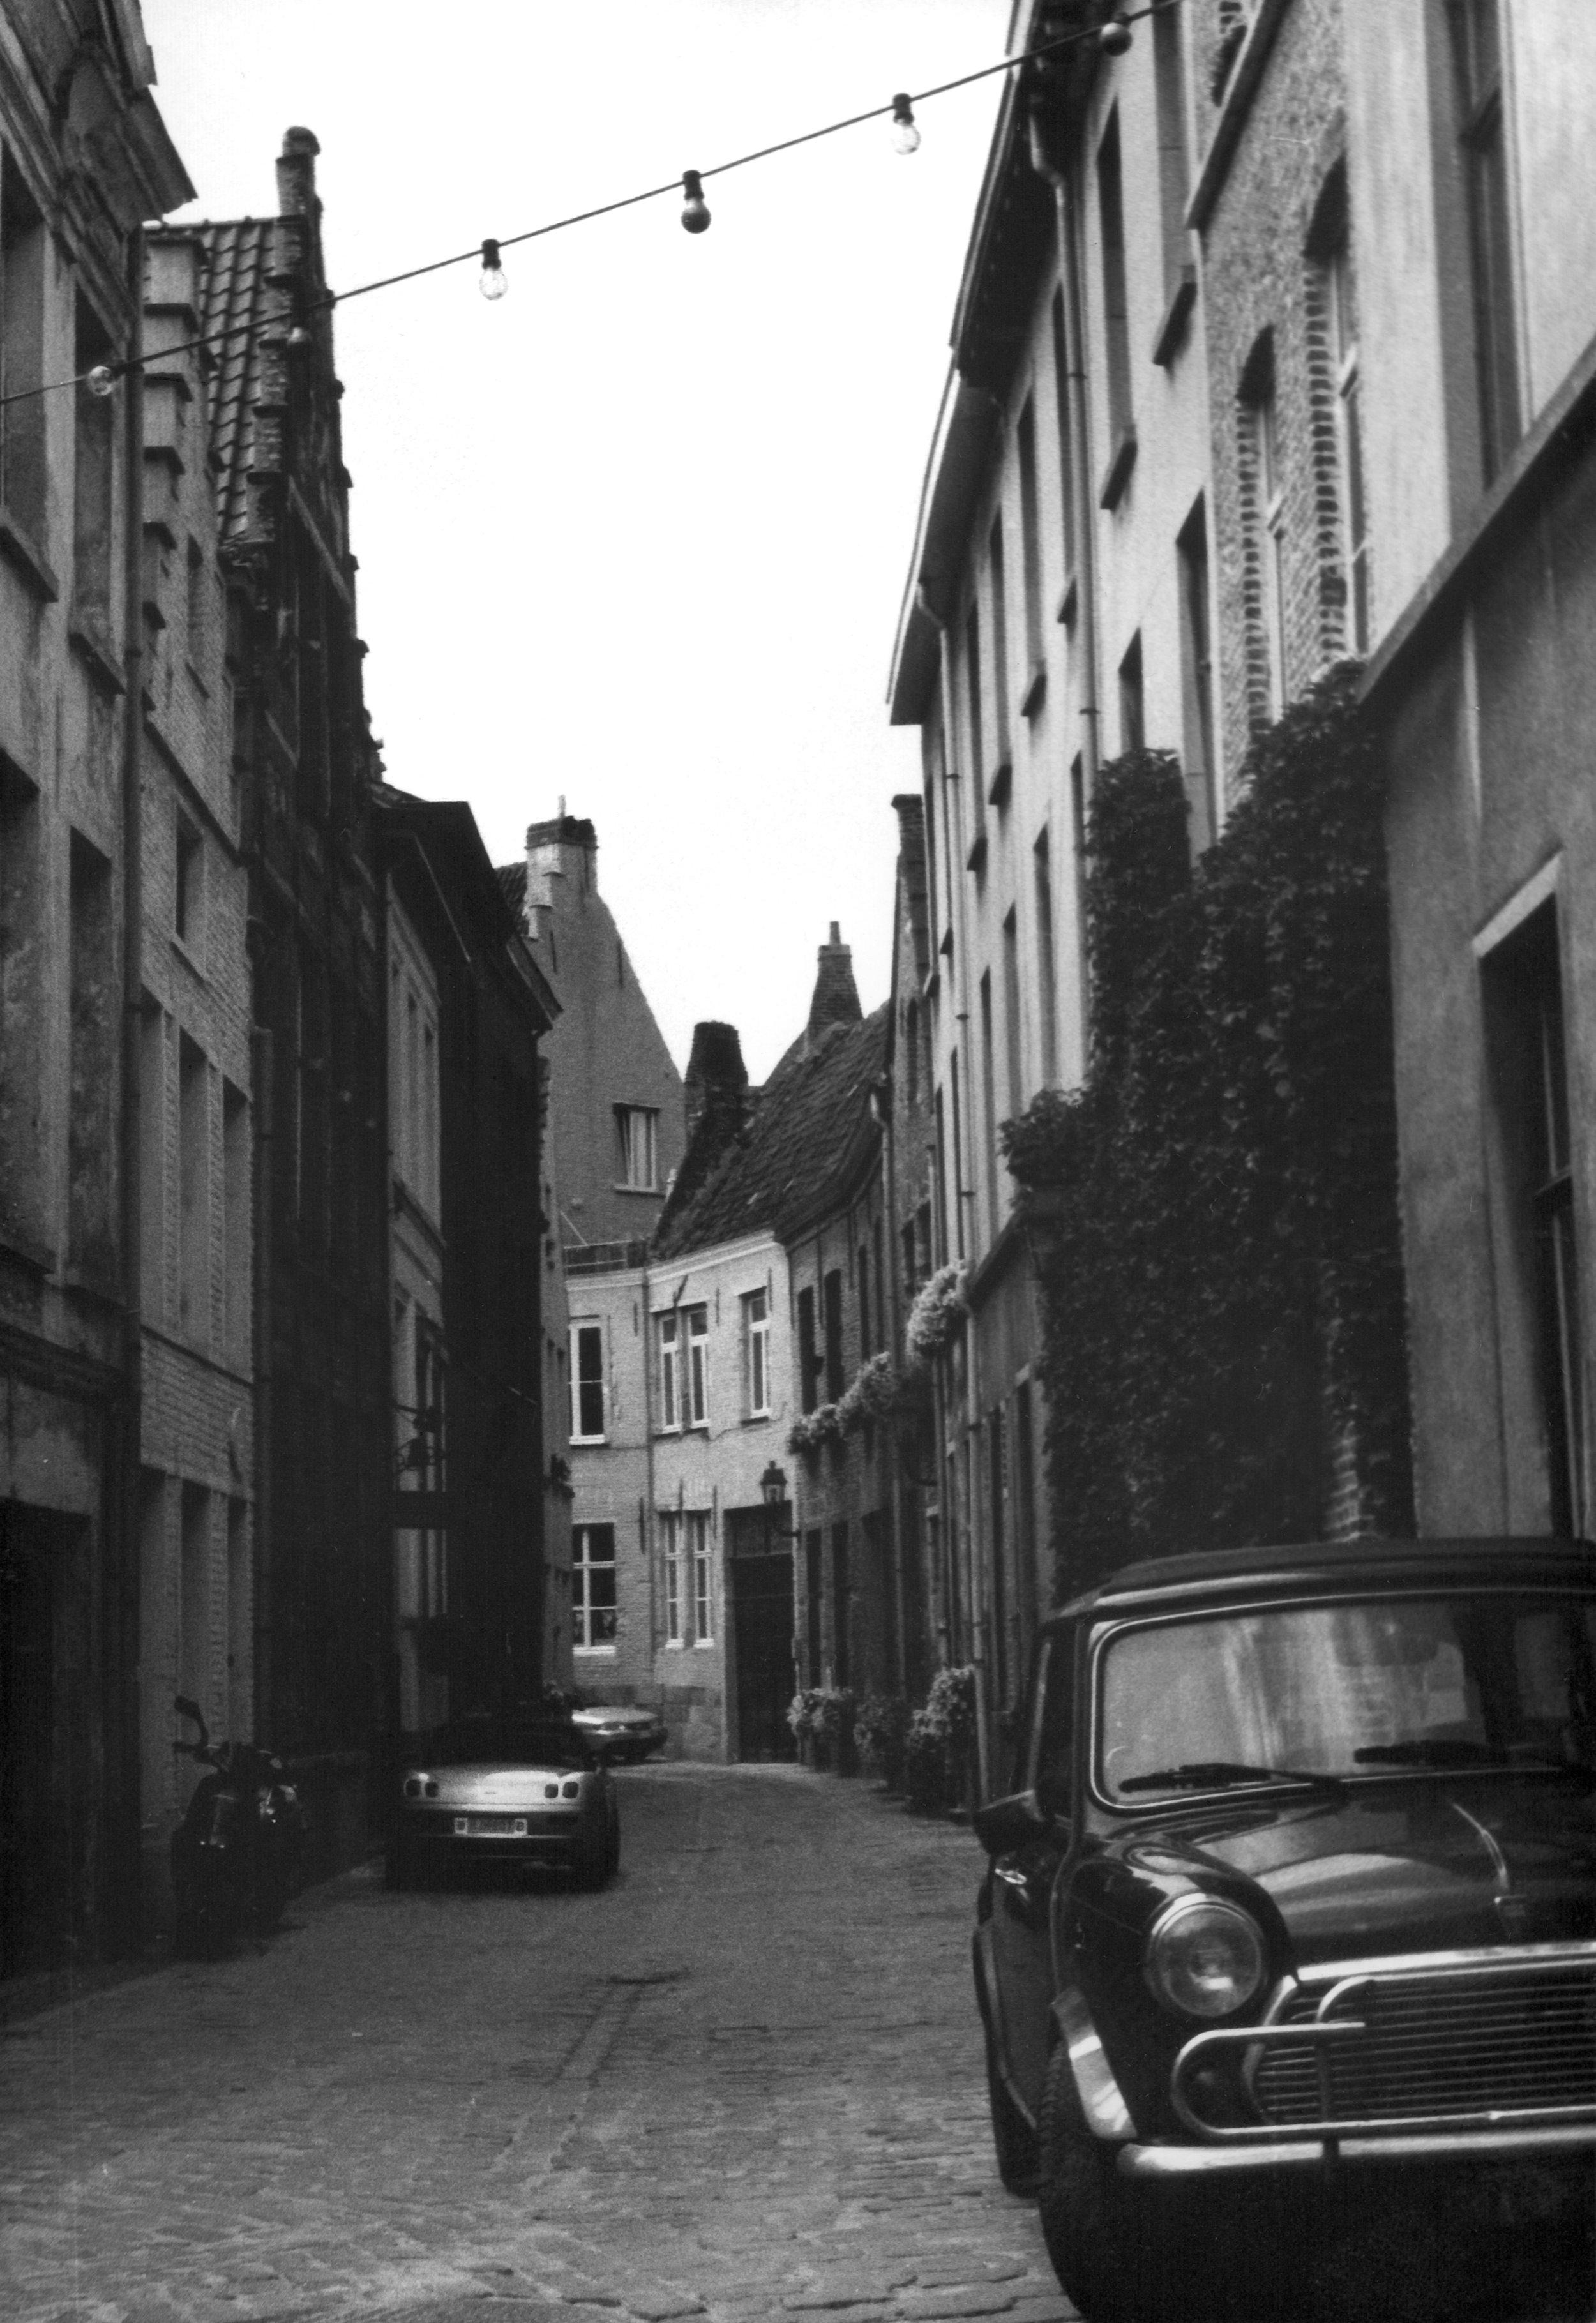 Gent, Belgium : Ilford HP5